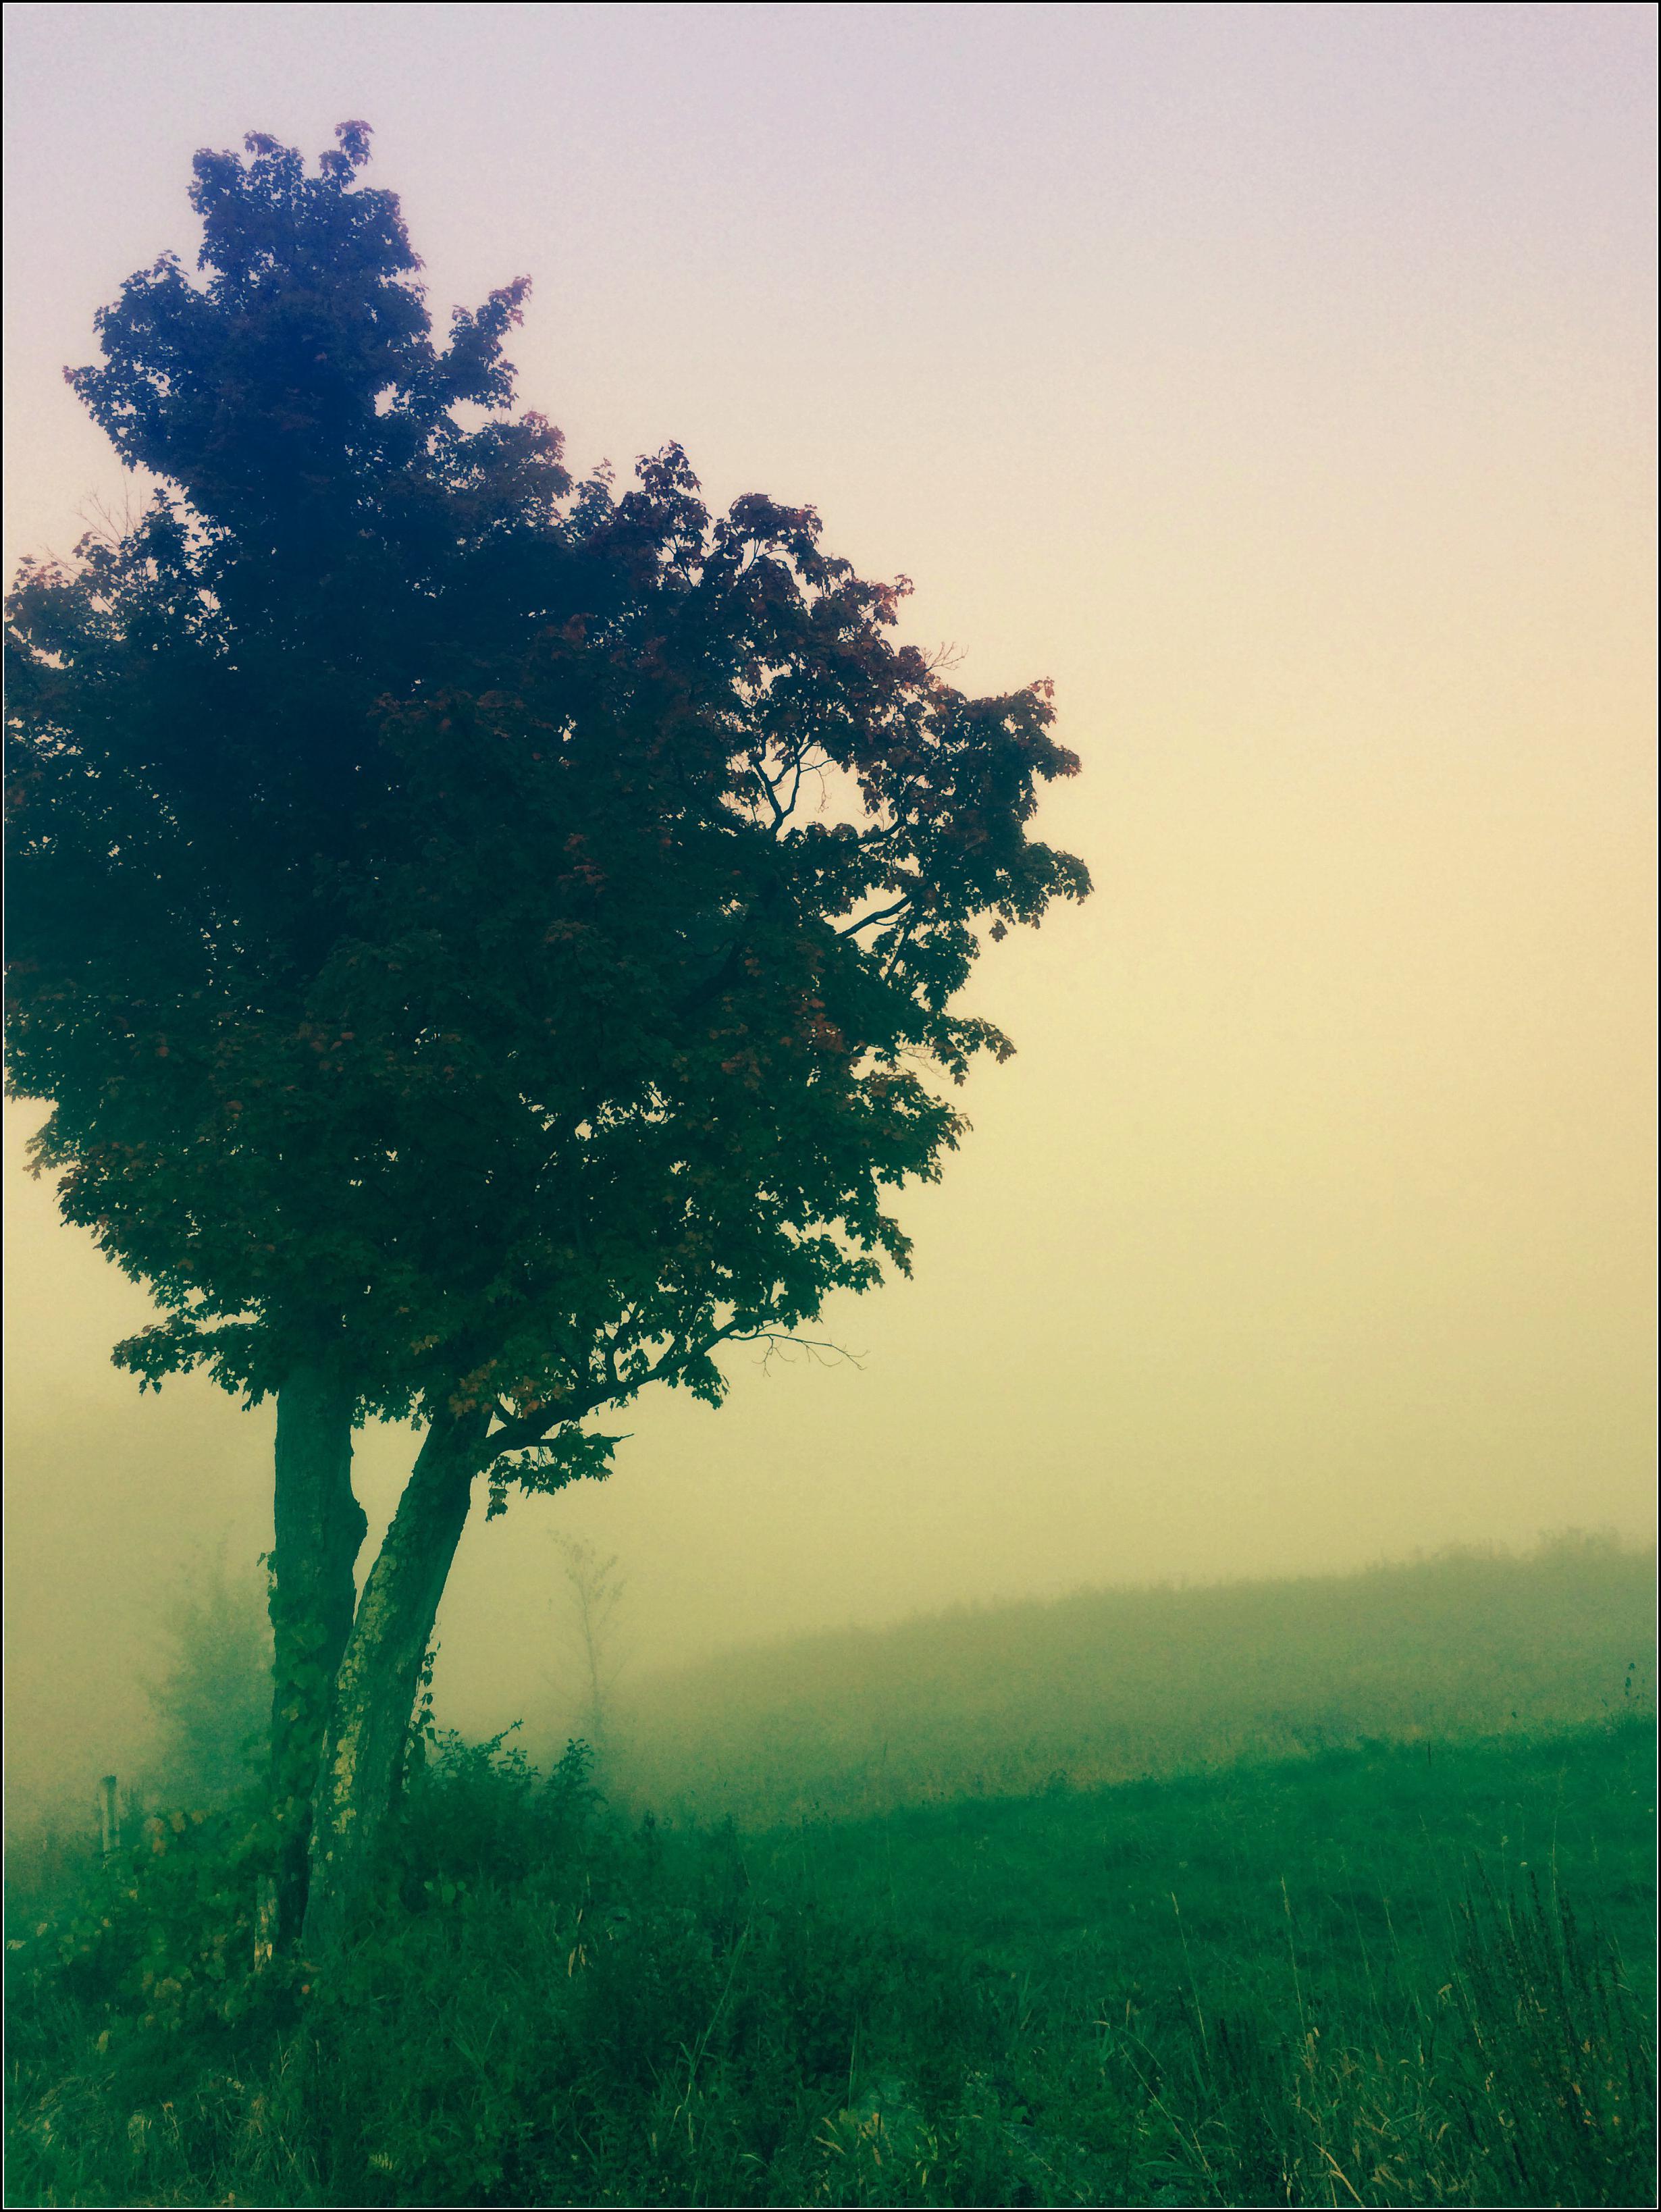 Lonely Tree, by Dena T BrayⒸ